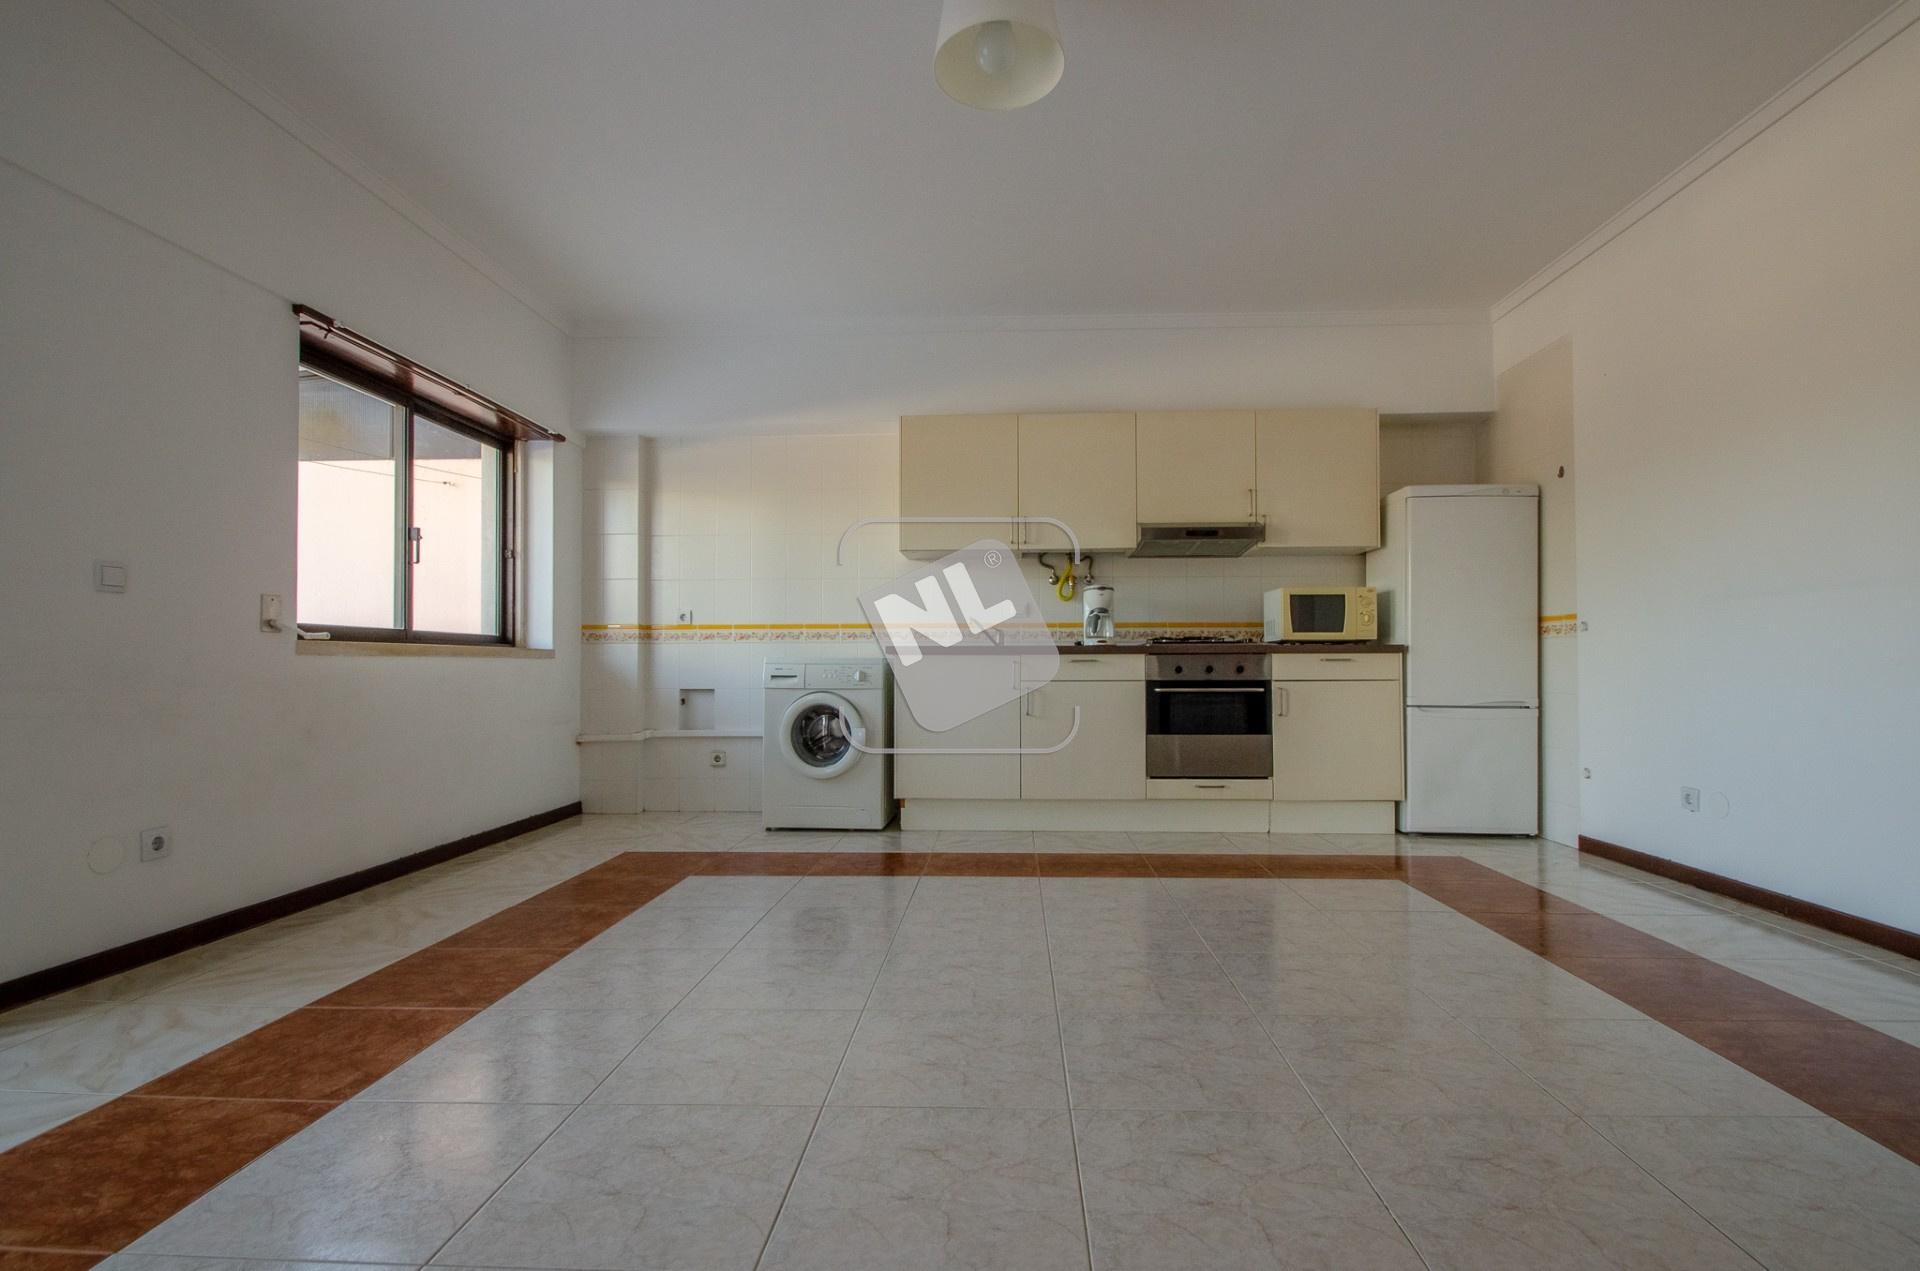 Sala-kitchenette 2